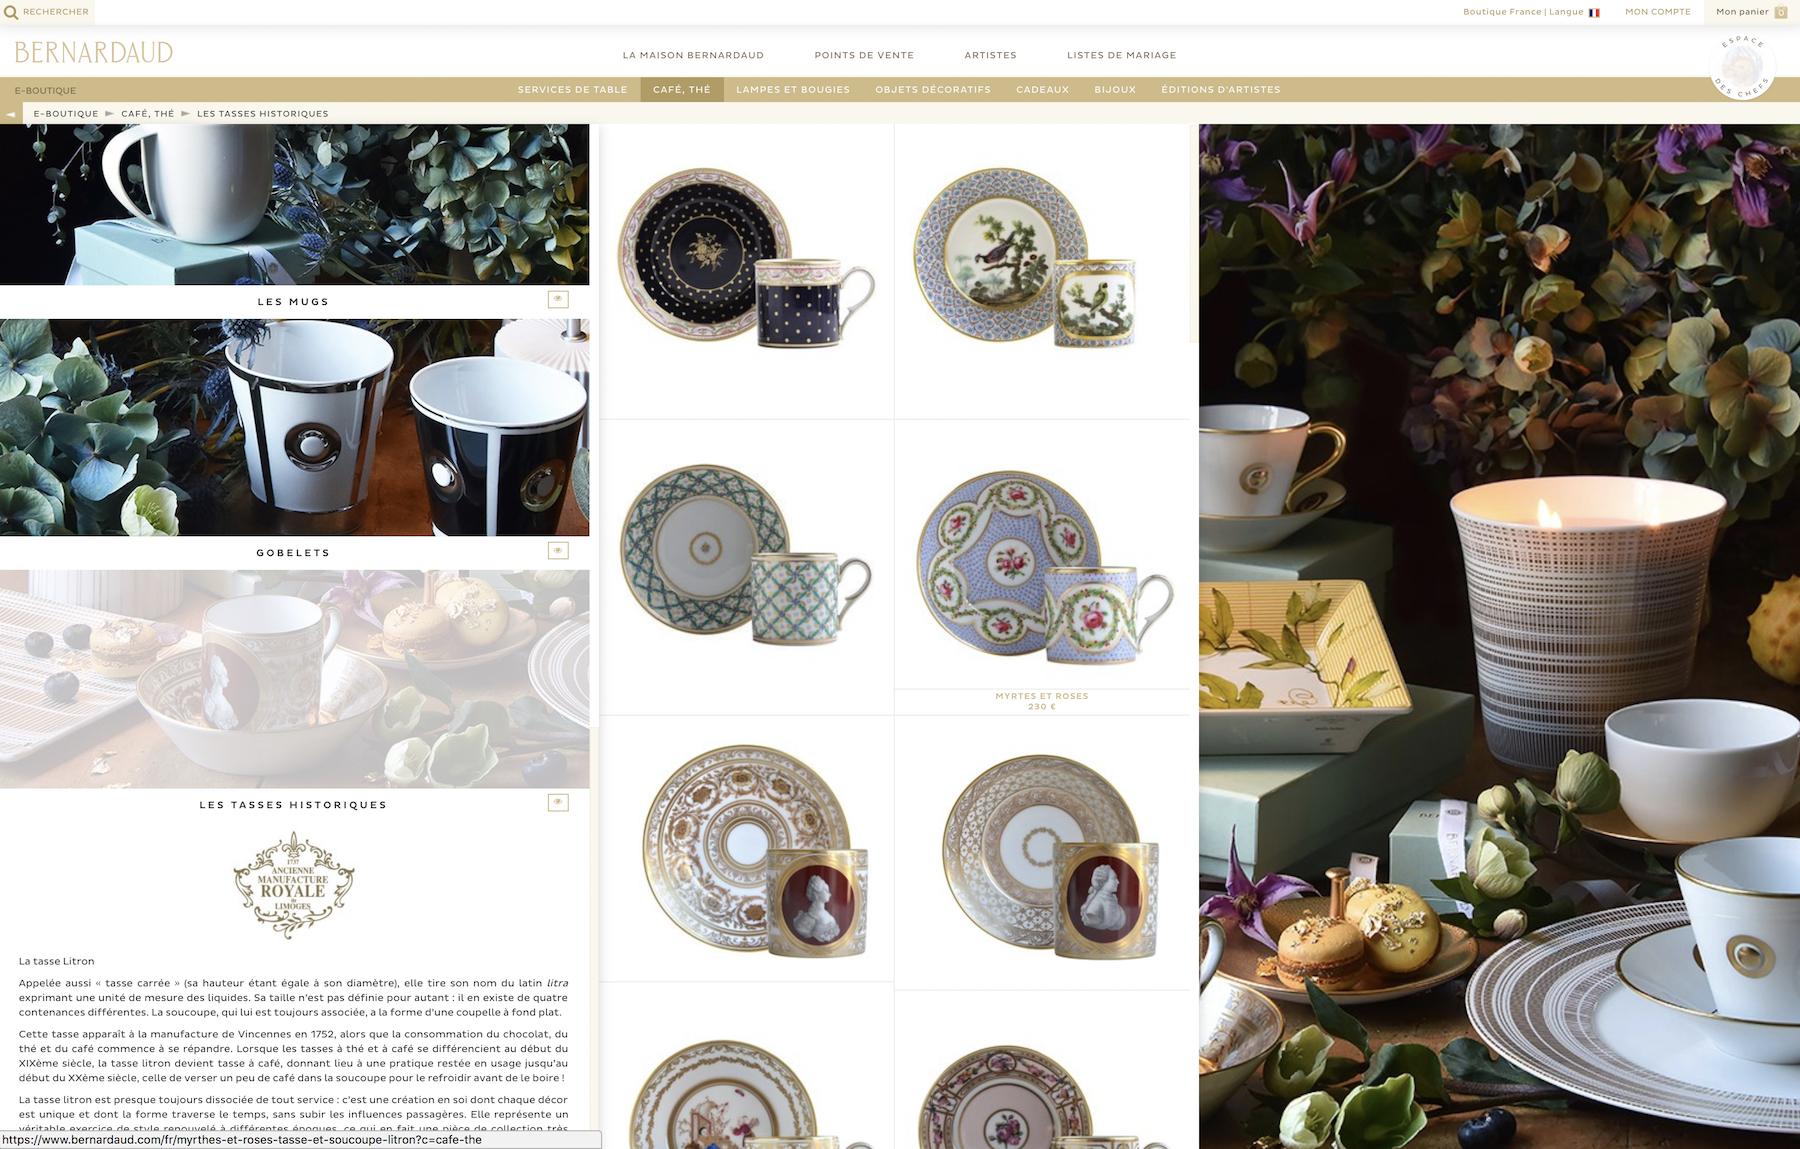 achat en ligne porcelaine bernardaud